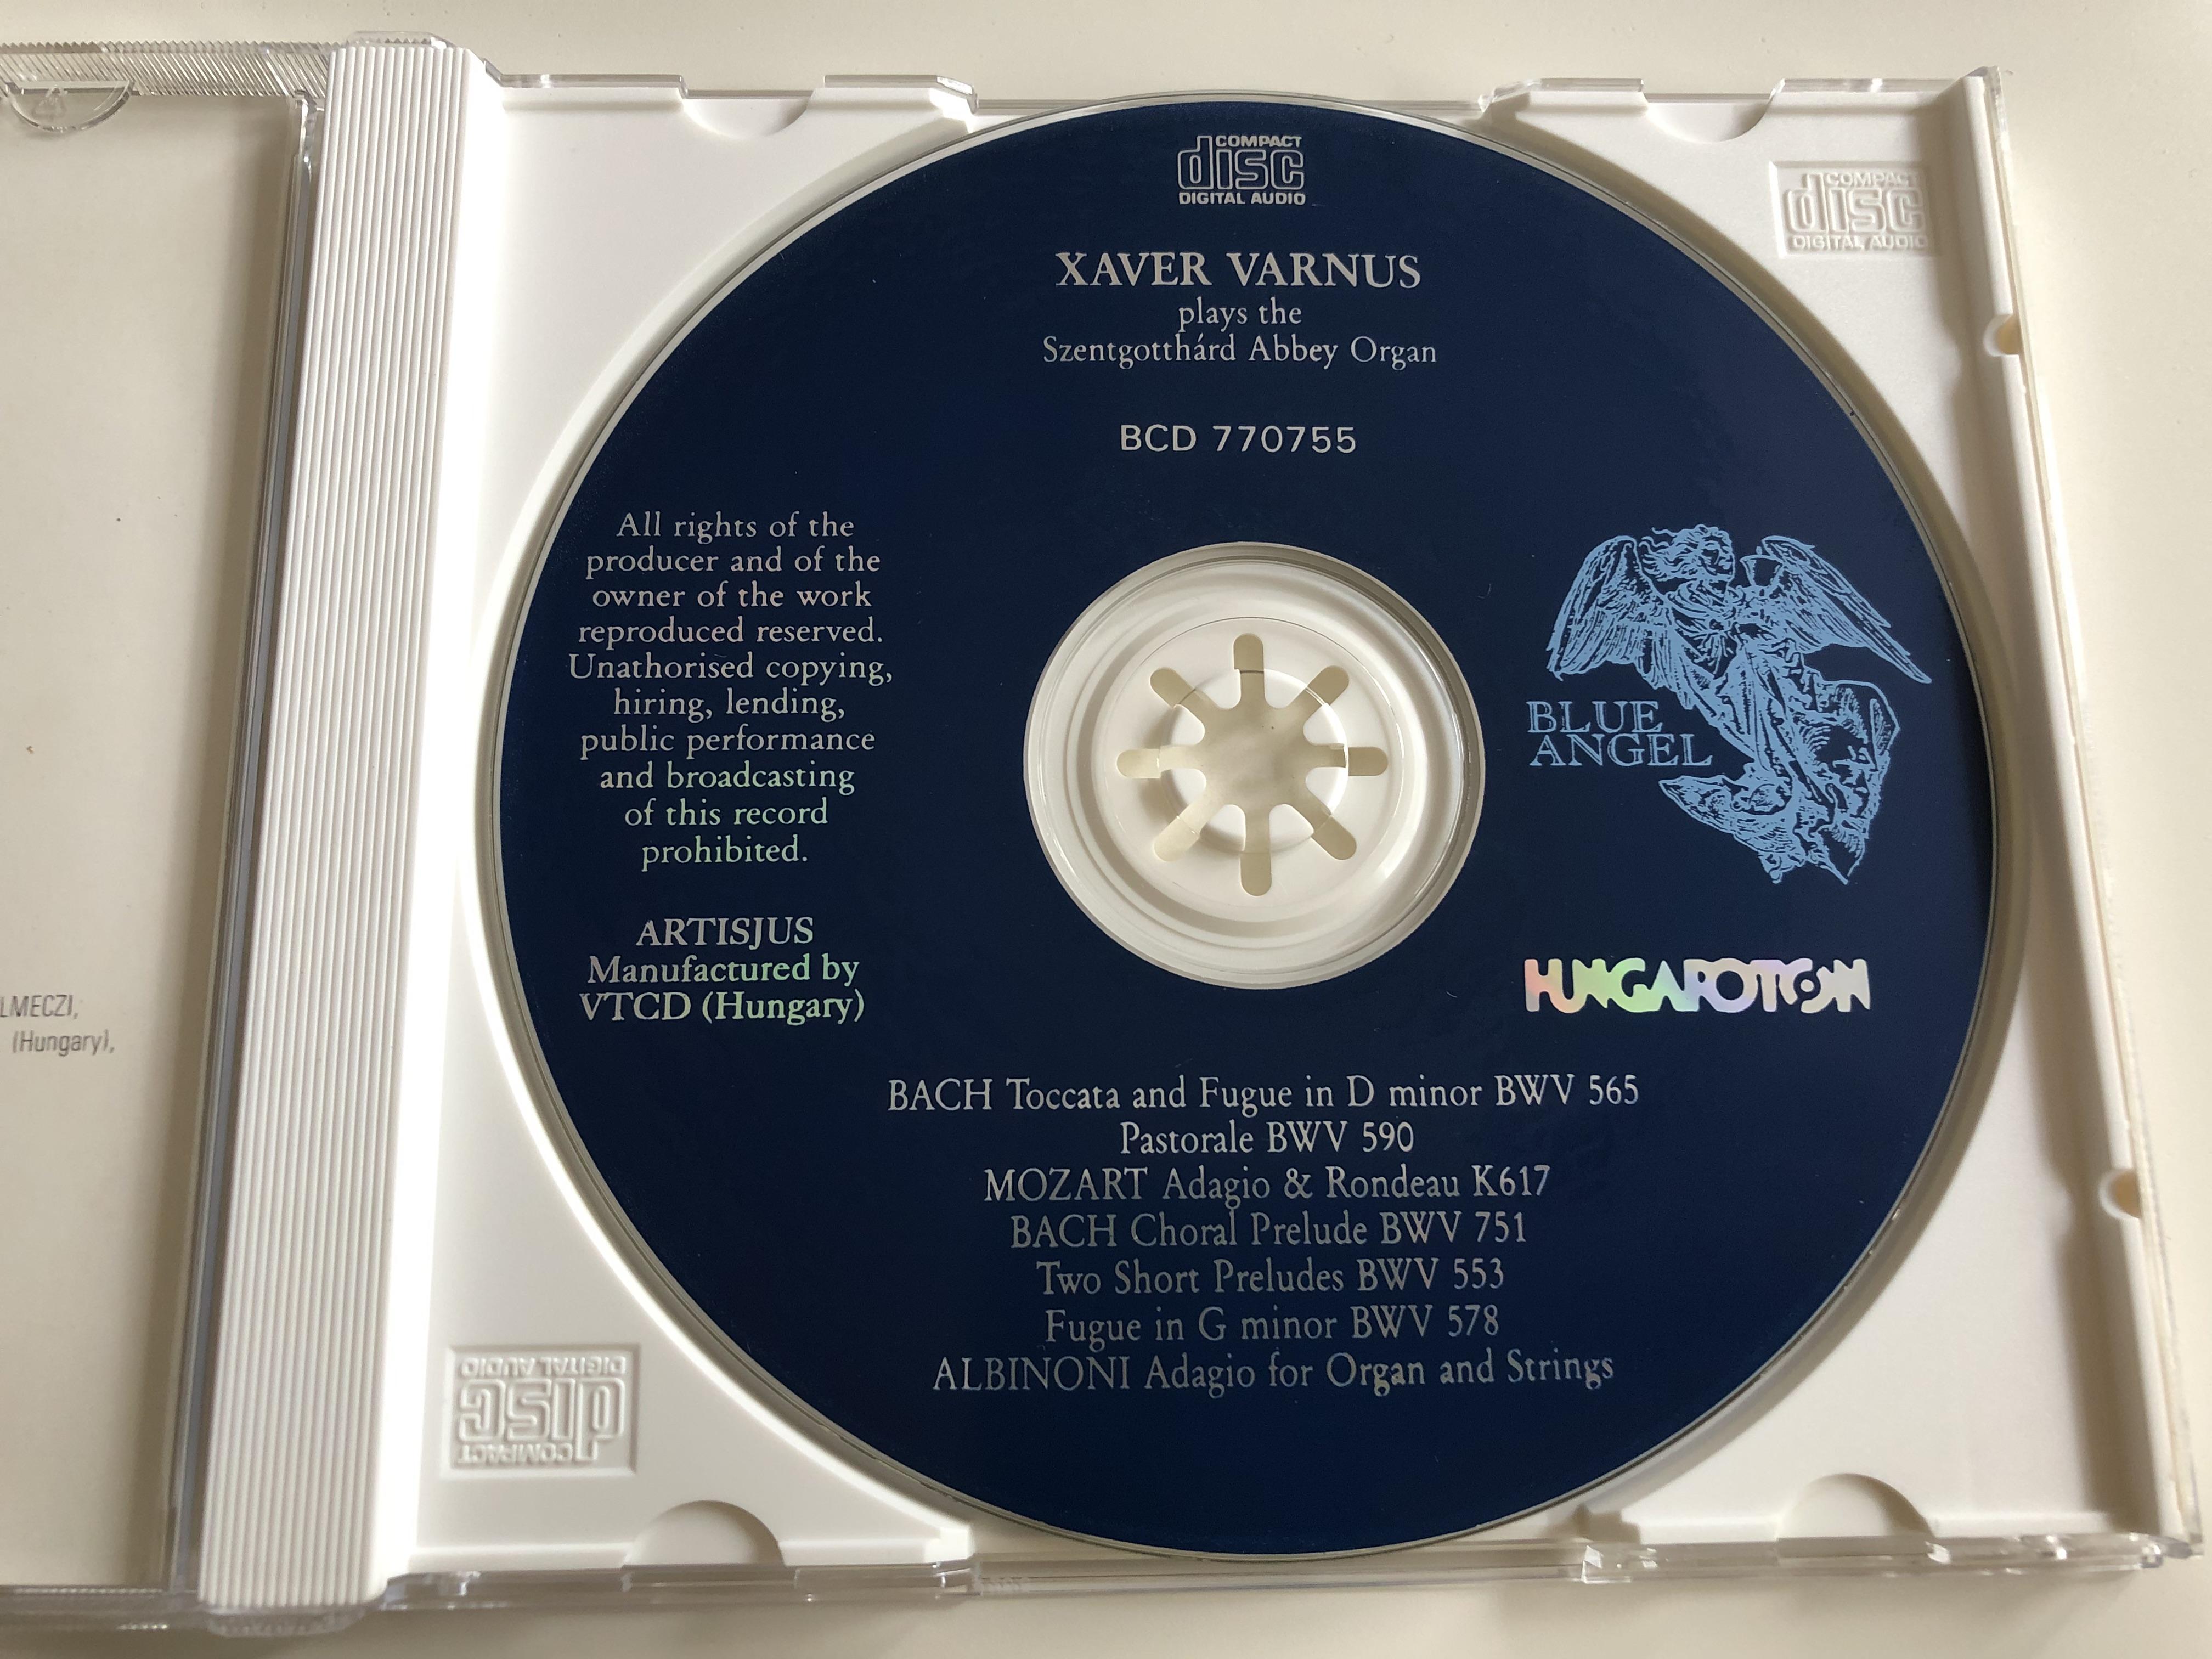 organ-magic-legendary-virtuoso-xaver-varnus-plays-the-baroque-organ-of-szentgotth-rd-abbey-bach-toccata-fugue-in-d-minor-mozart-adagio-rondeau-albinoni-adagio-hungaroton-bcd-770755-audio-cd-1992-5-.jpg